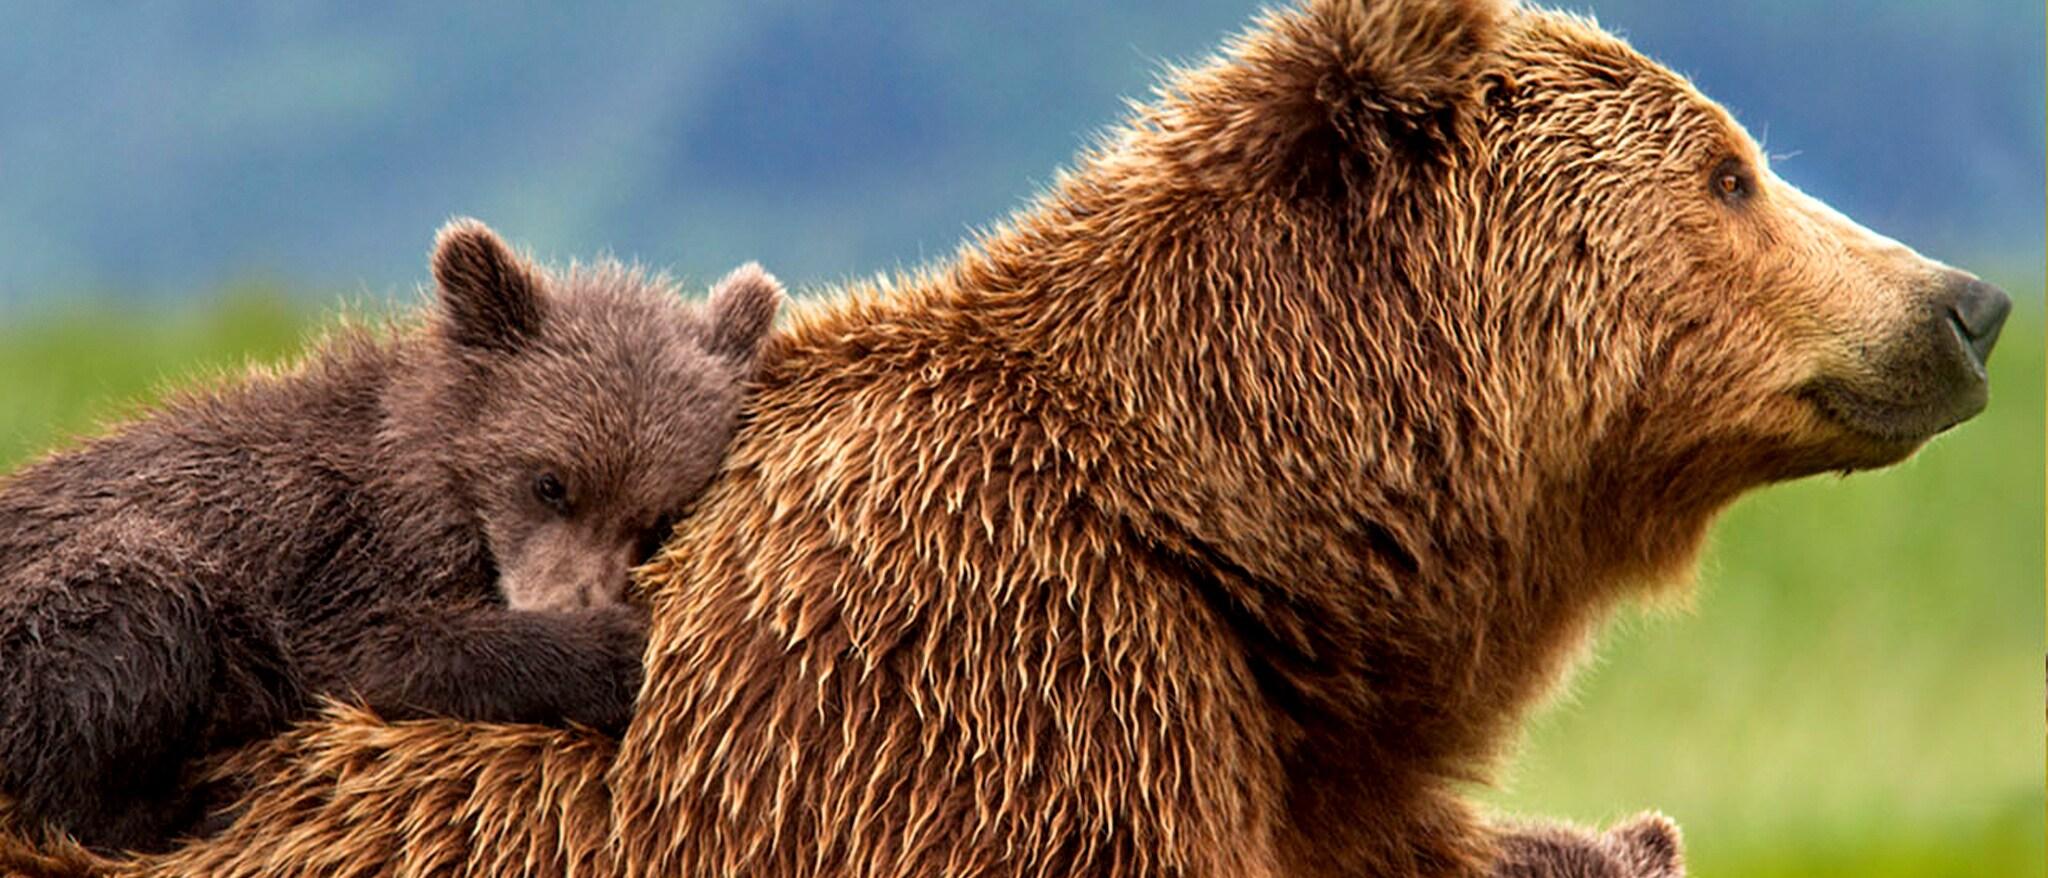 Disneynature: Bears Hero